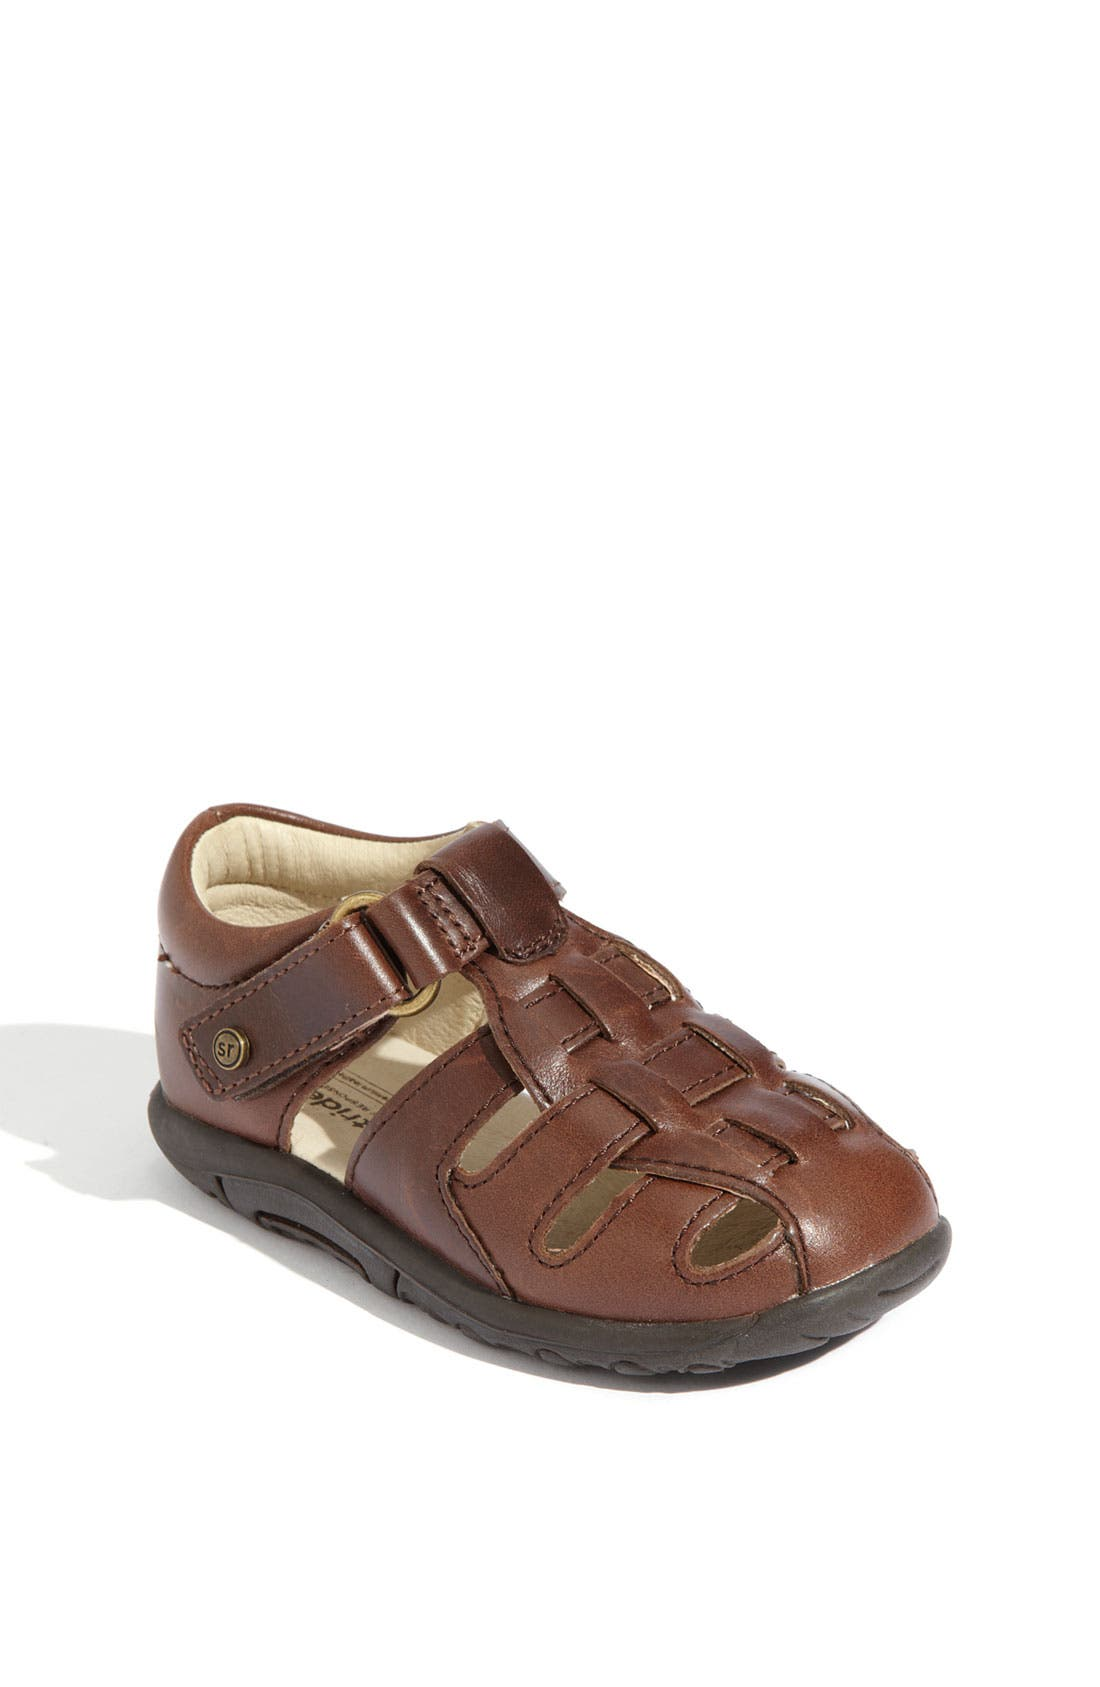 Alternate Image 1 Selected - Stride Rite 'Harper' Sandal (Baby, Walker & Toddler)